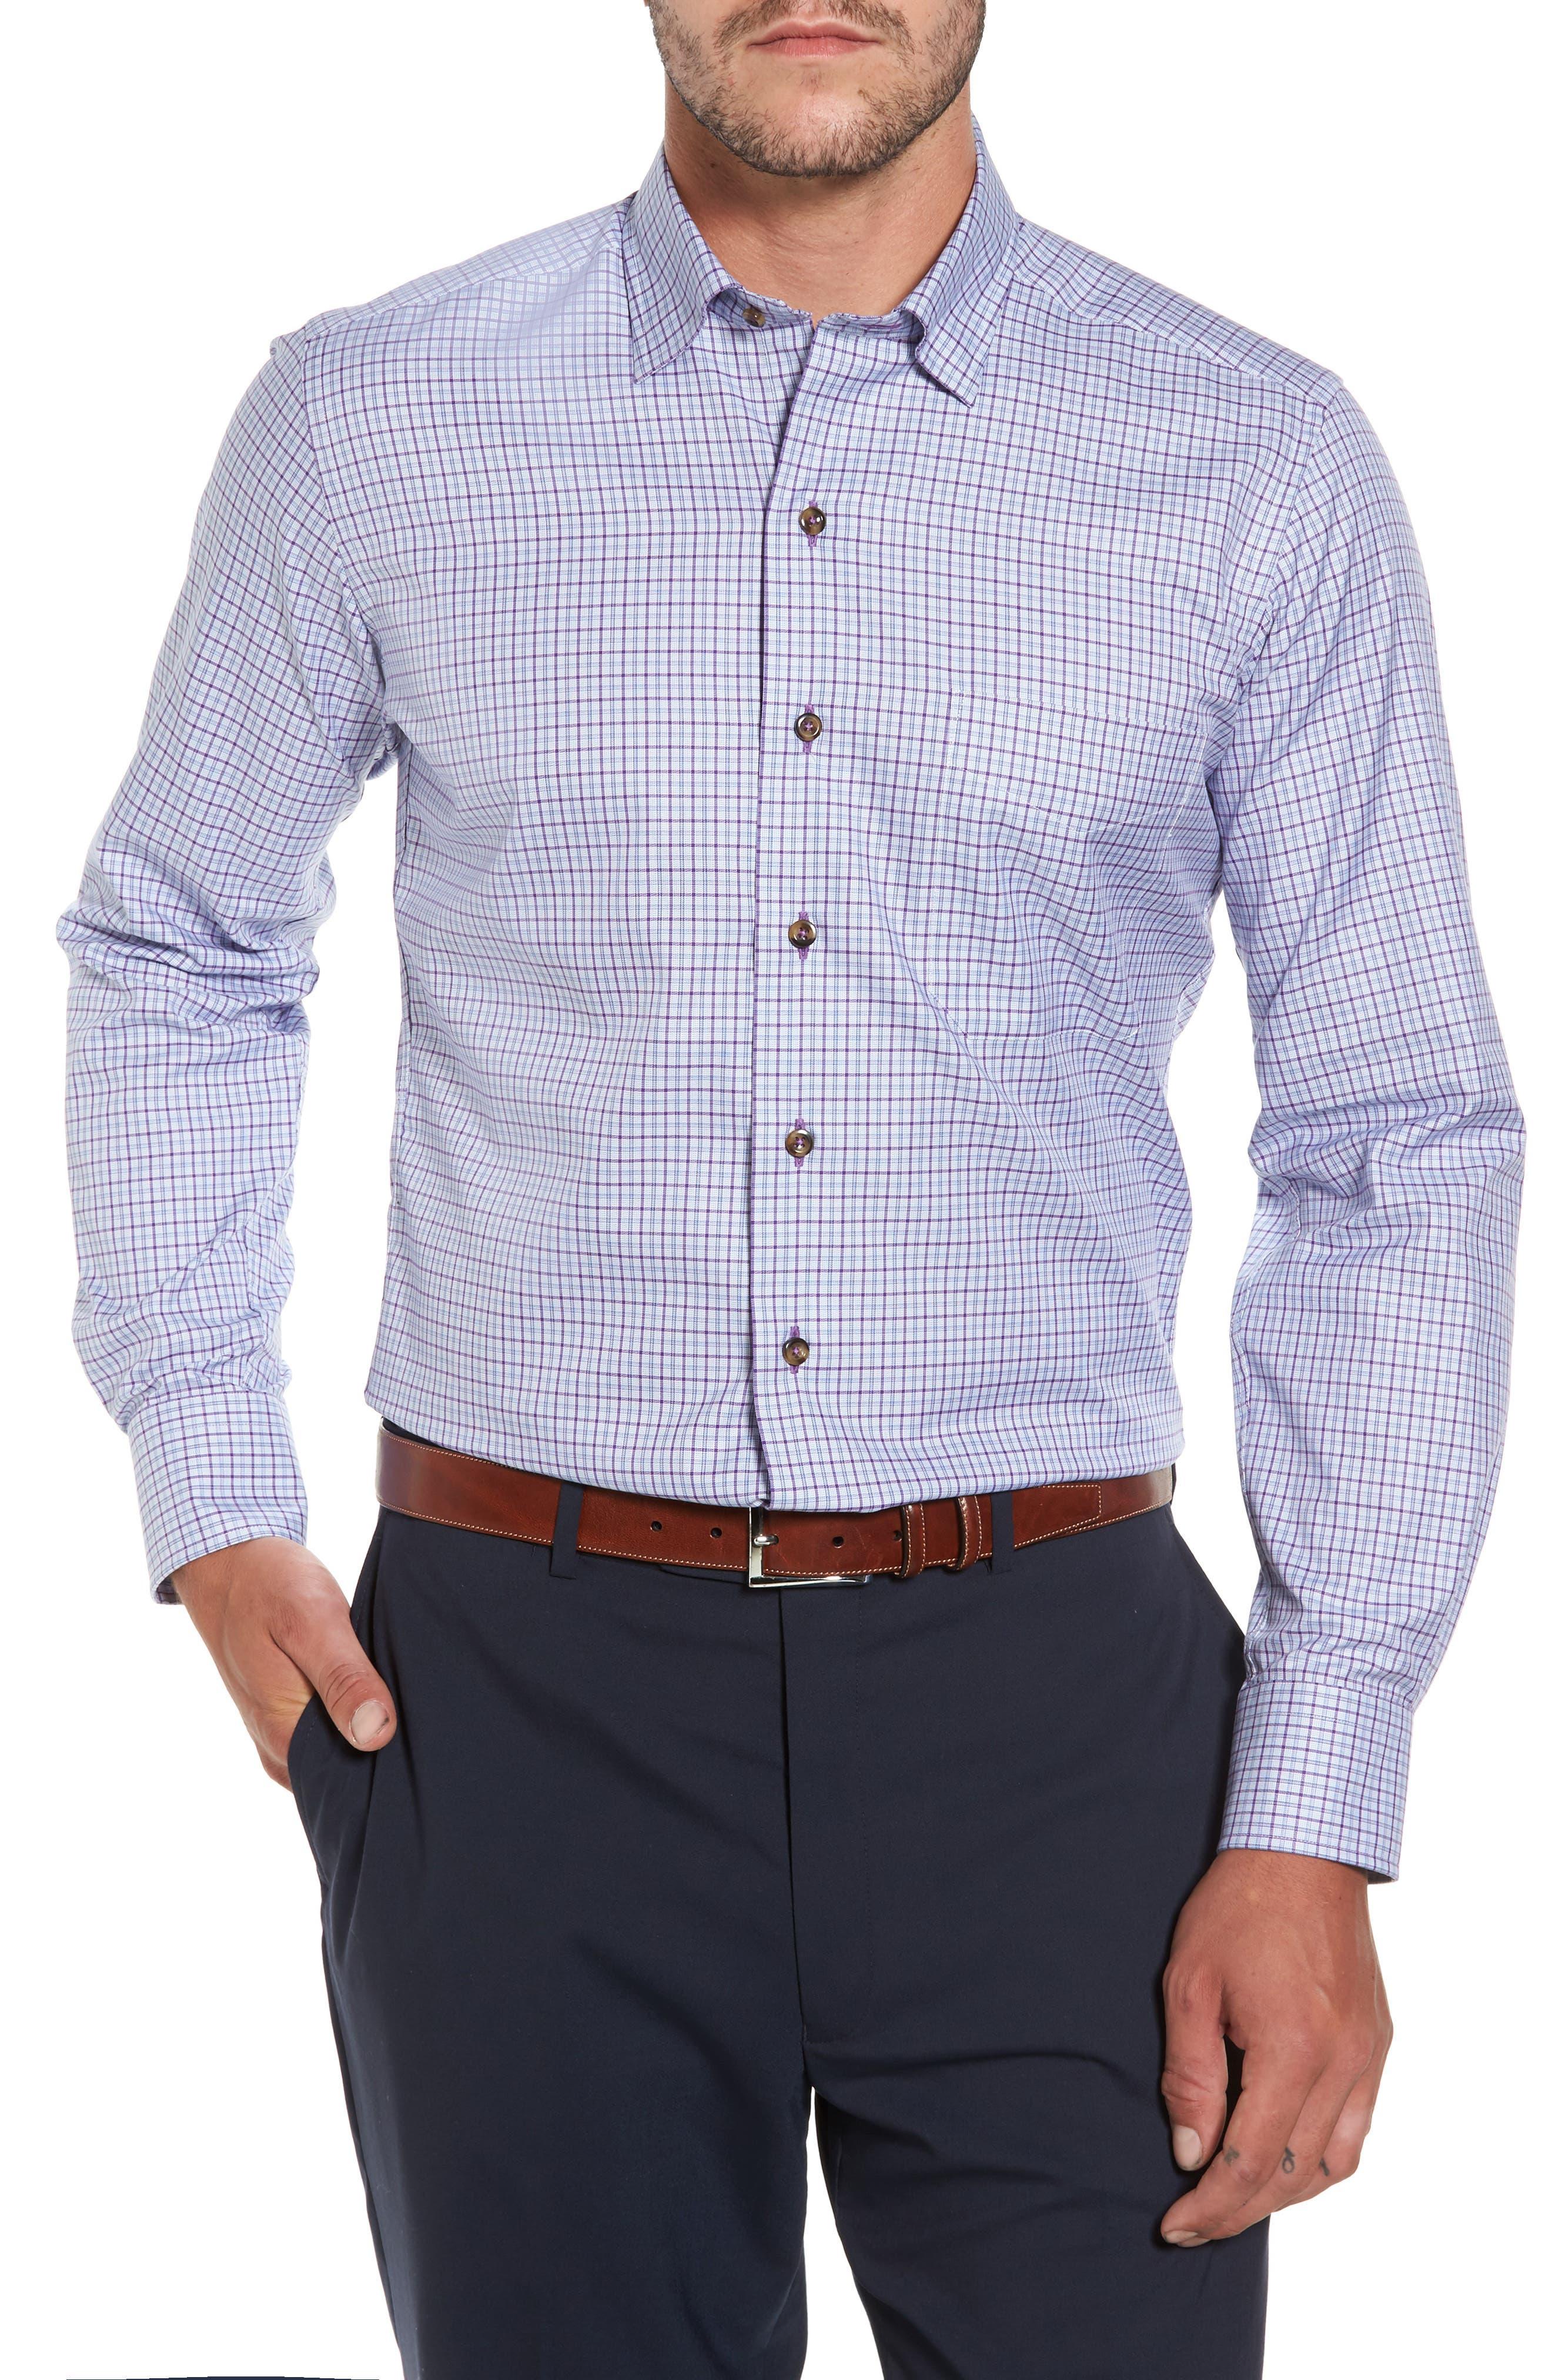 Alternate Image 1 Selected - David Donahue Plaid Regular Fit Sport Shirt